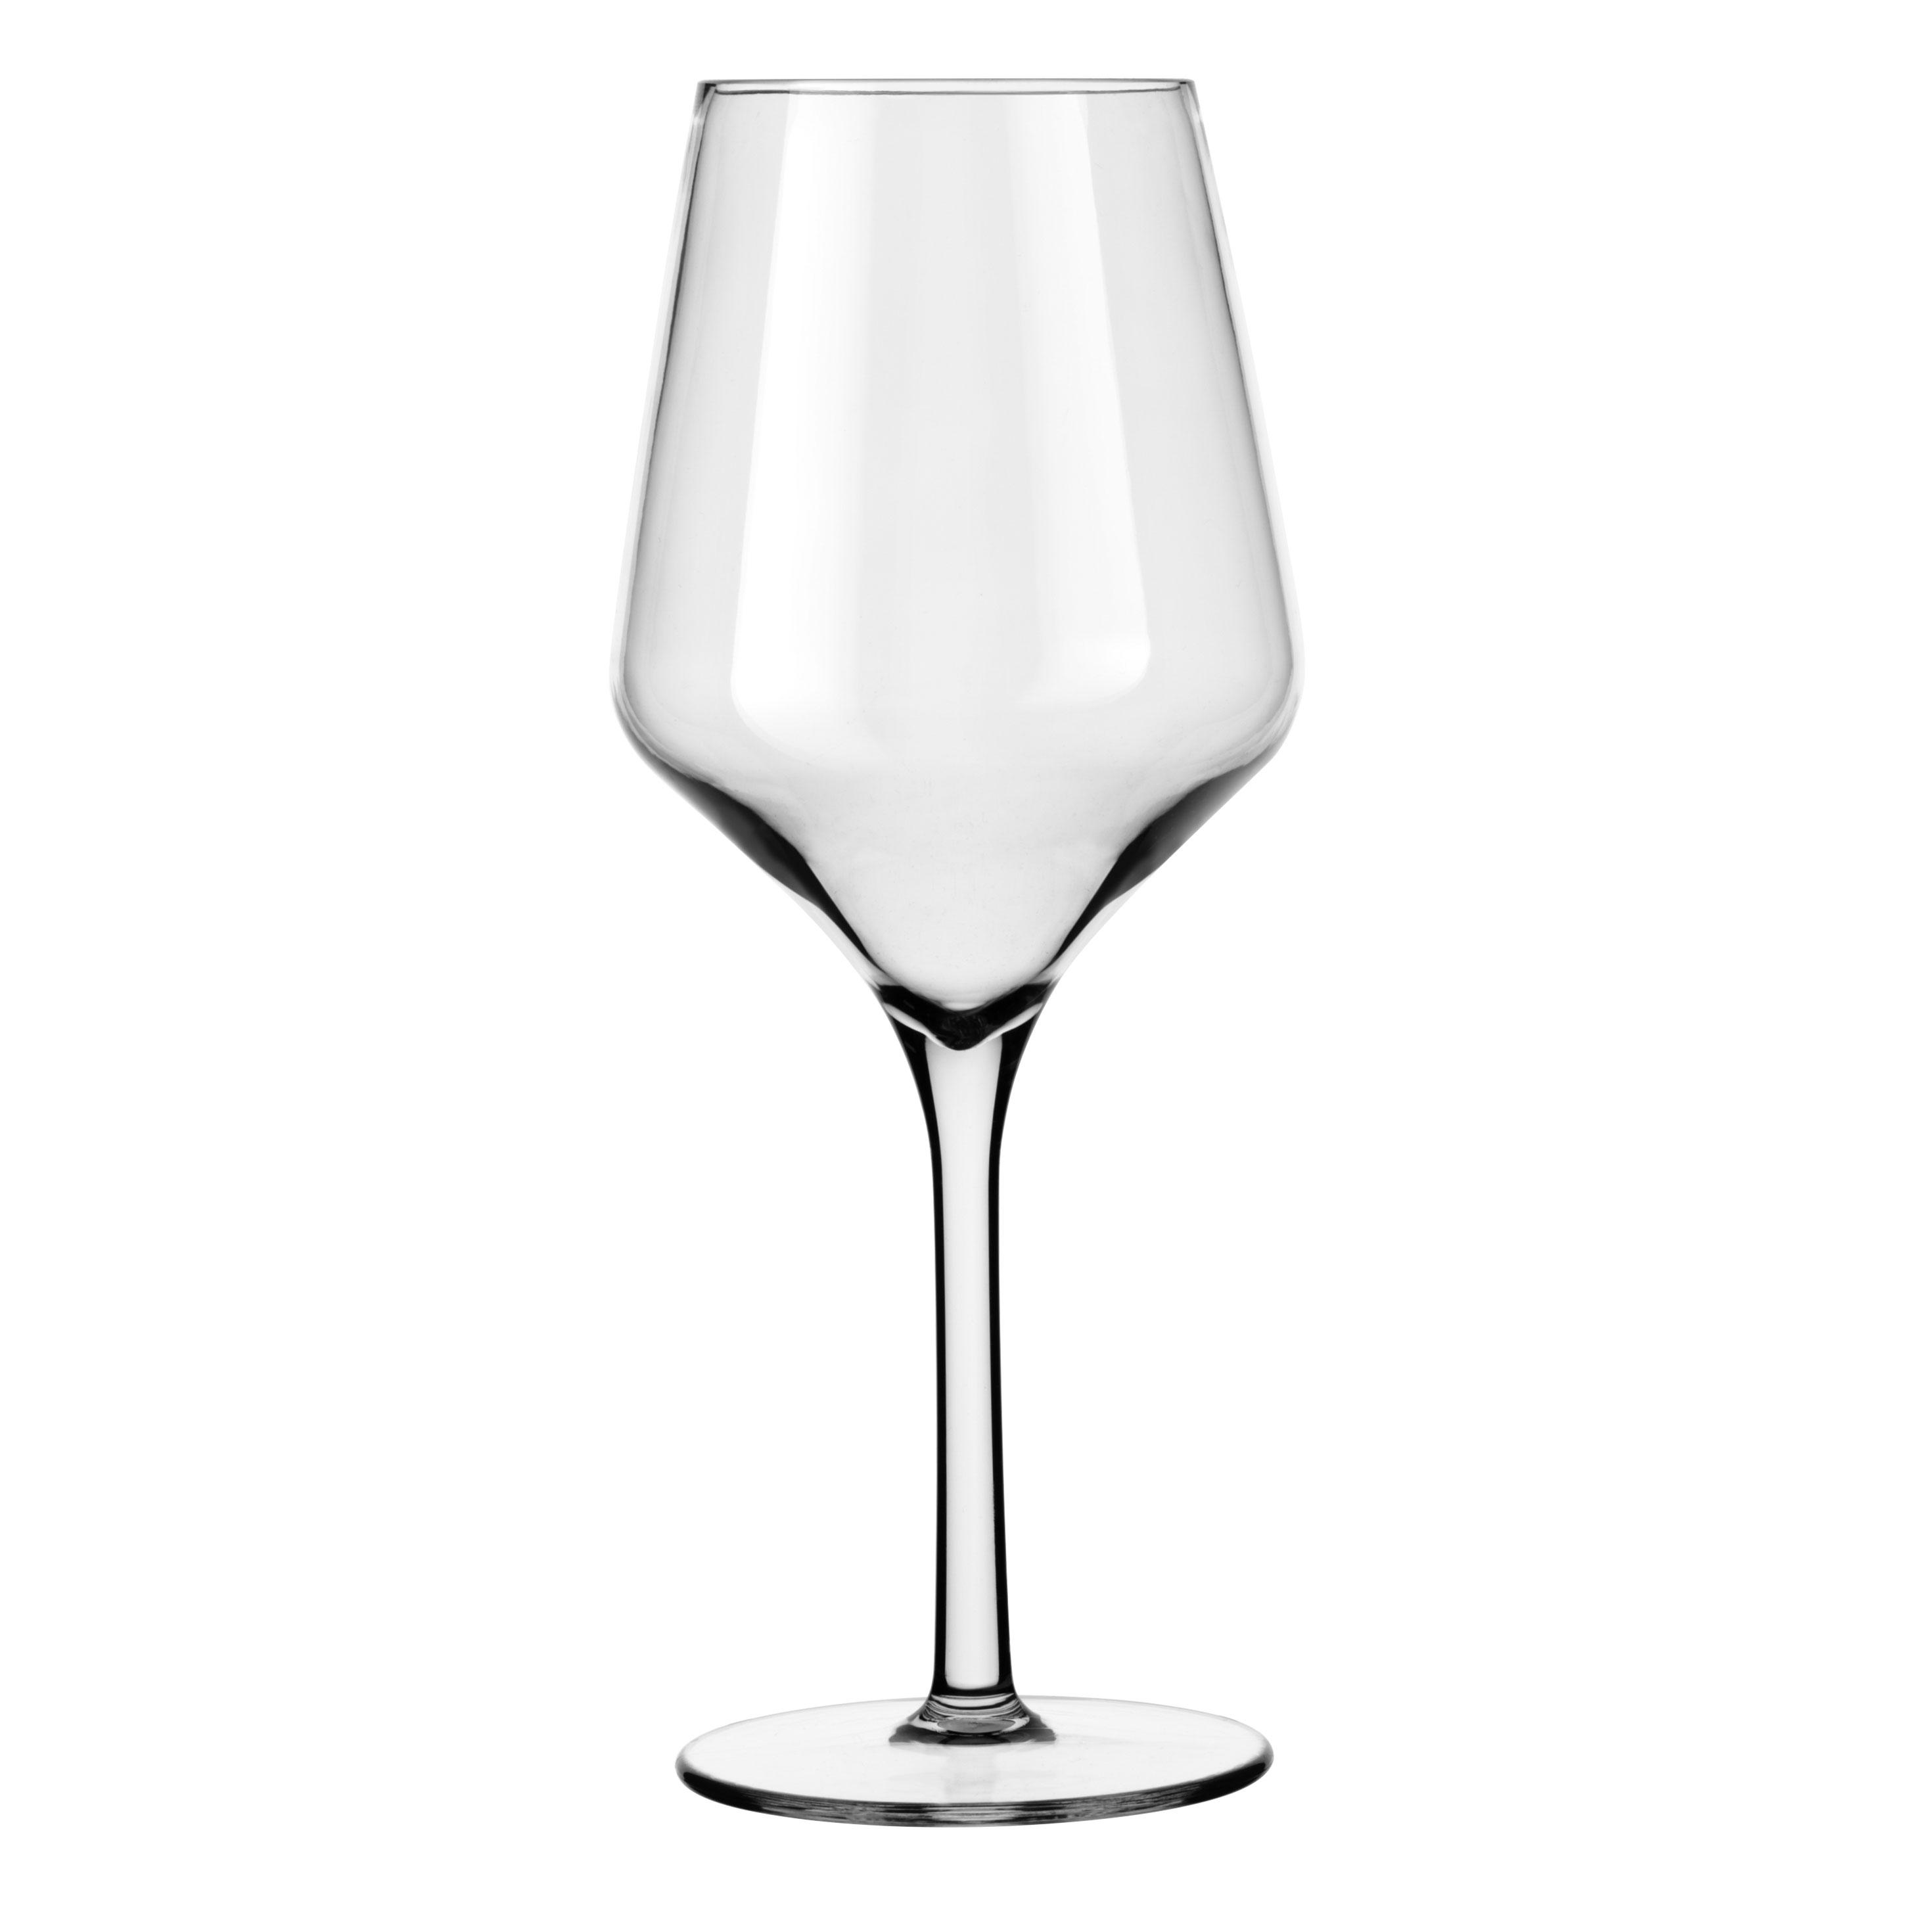 Libbey Glass 92450 glassware, plastic